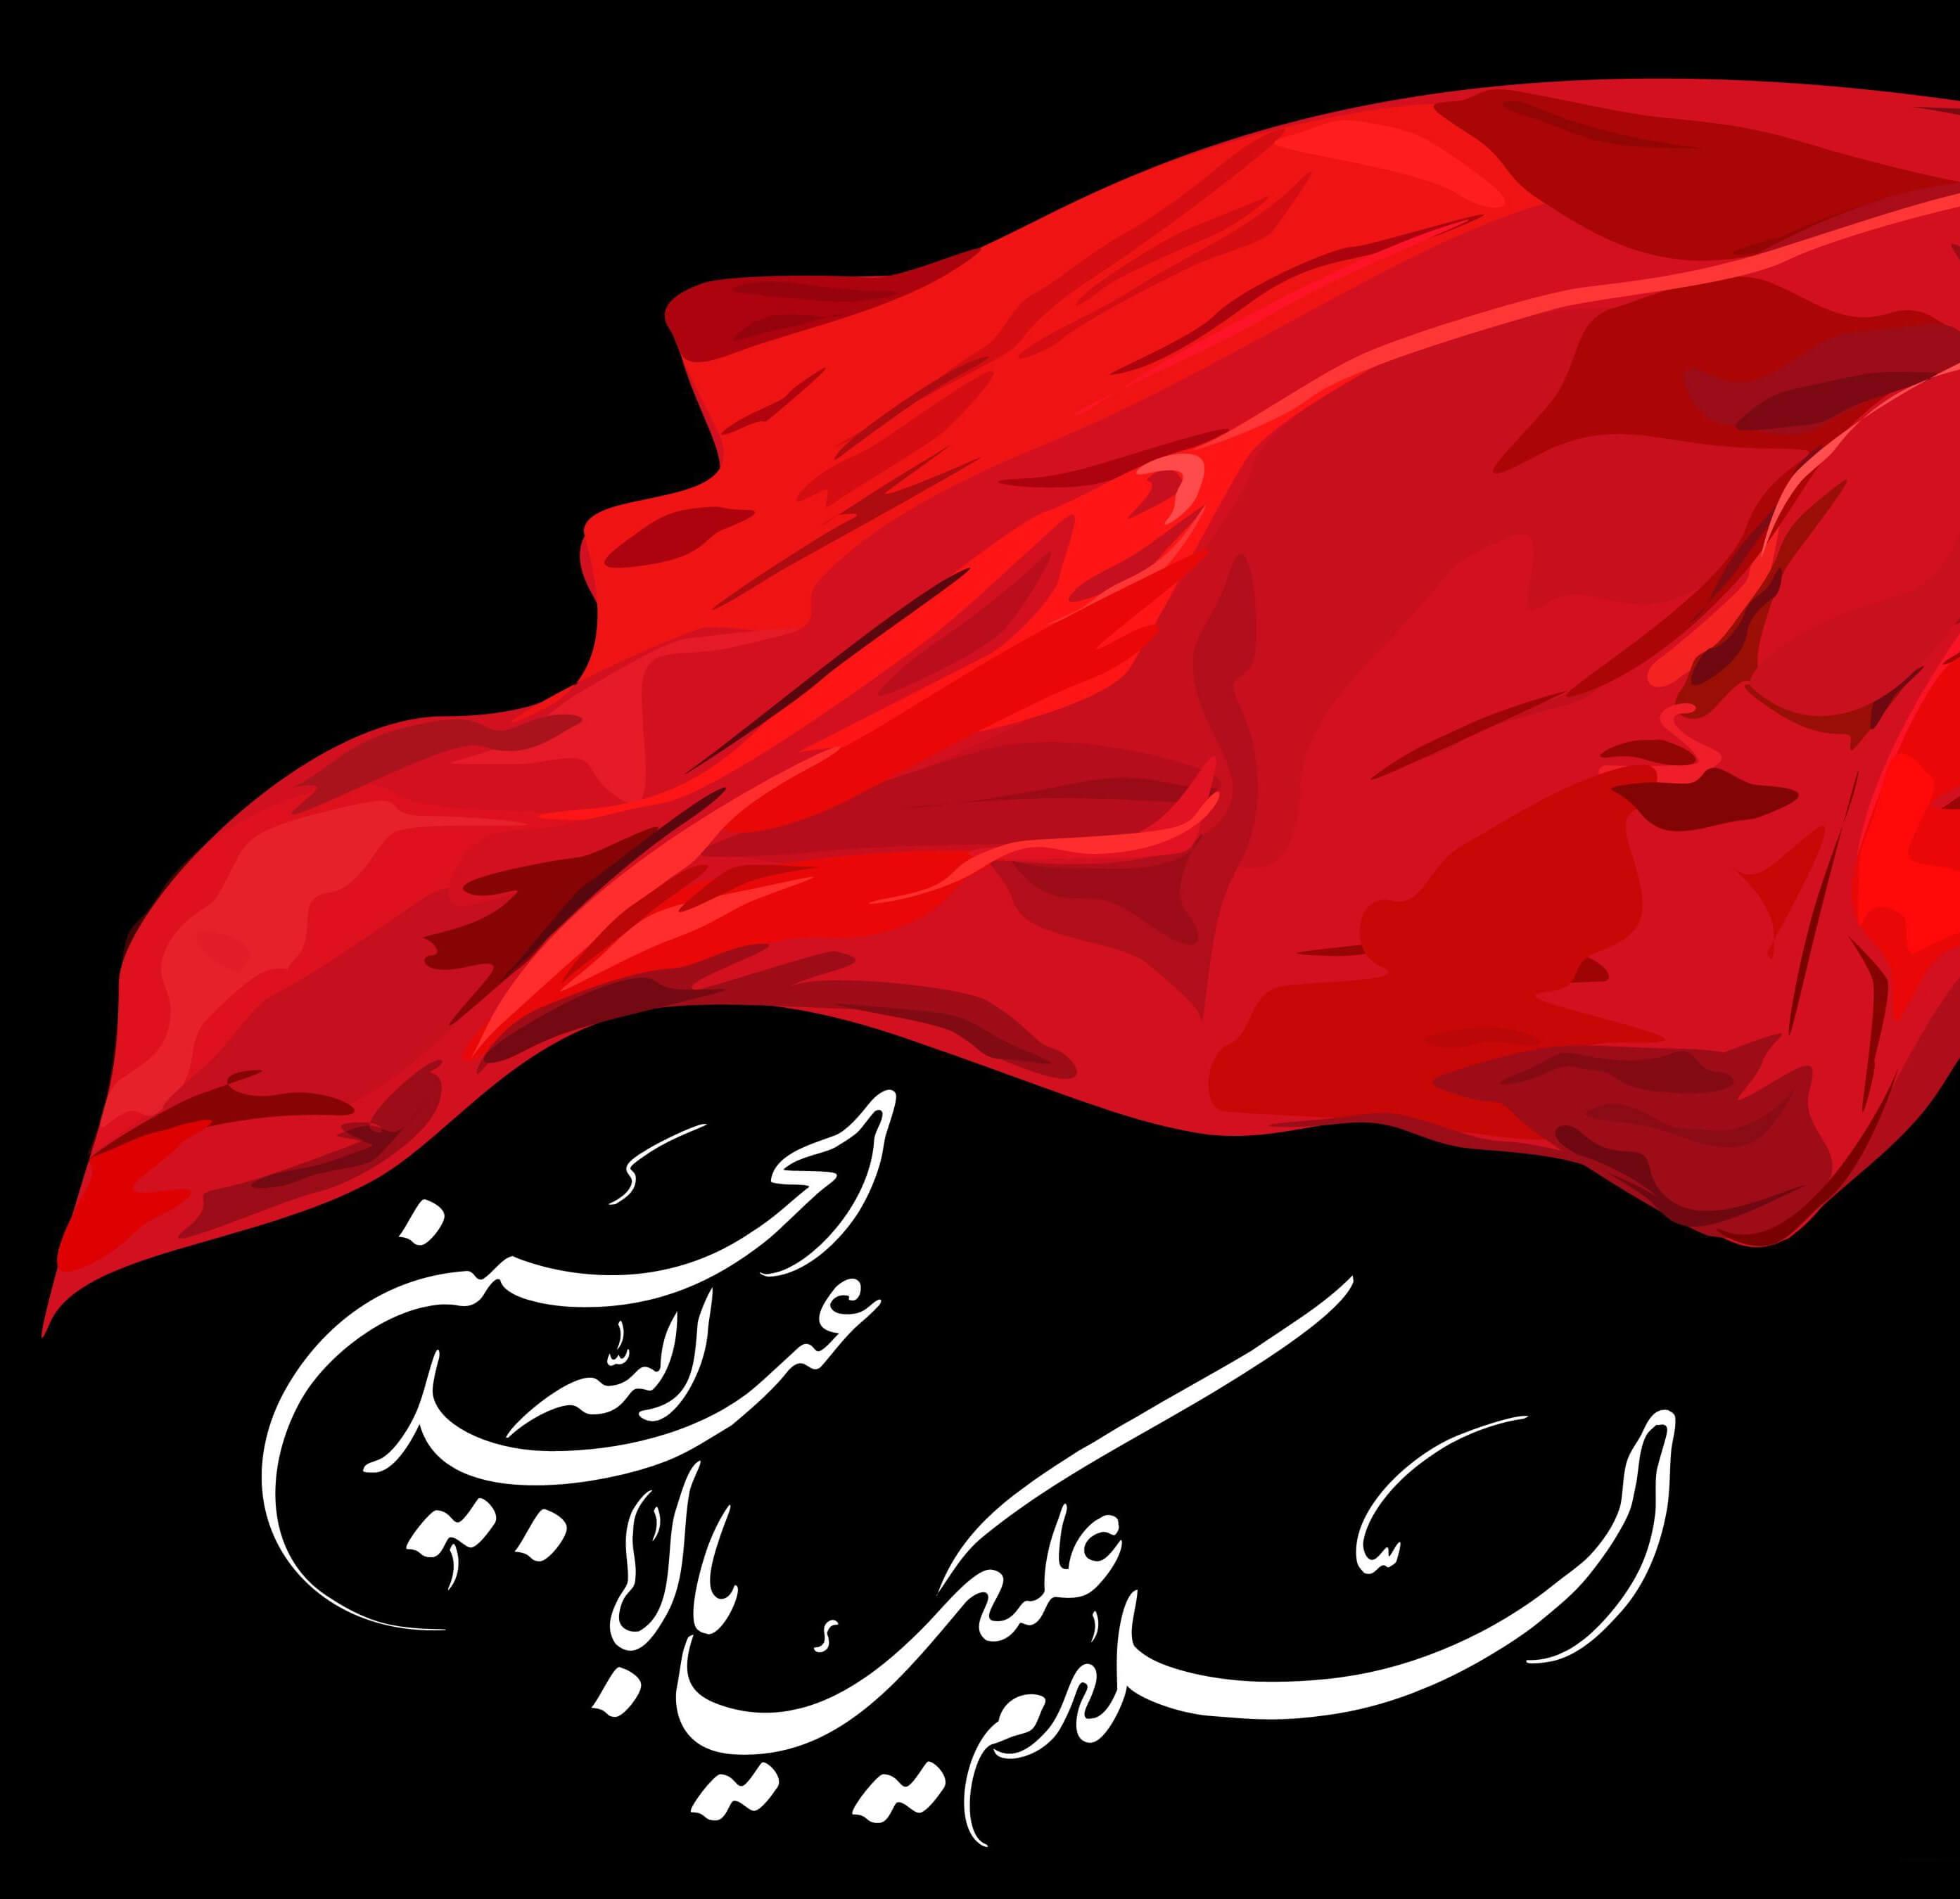 السلام علیک یا ابا عبدالله الحسین (ع)